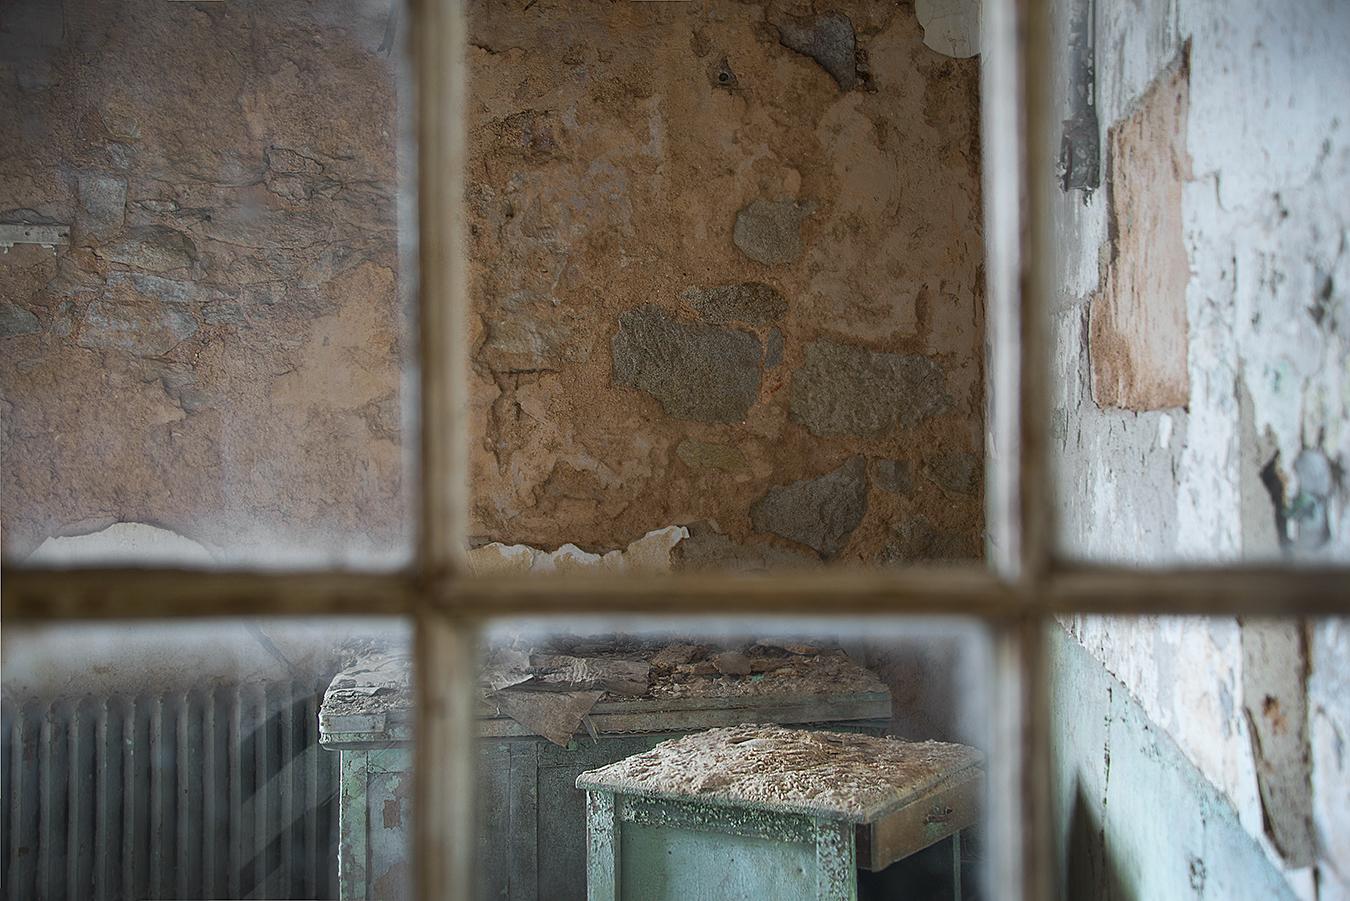 Zoe_Photography_EasternStatePenitentiary_Philadelphia_TheLostPast_TheGrid_Window_BrokenMemeory